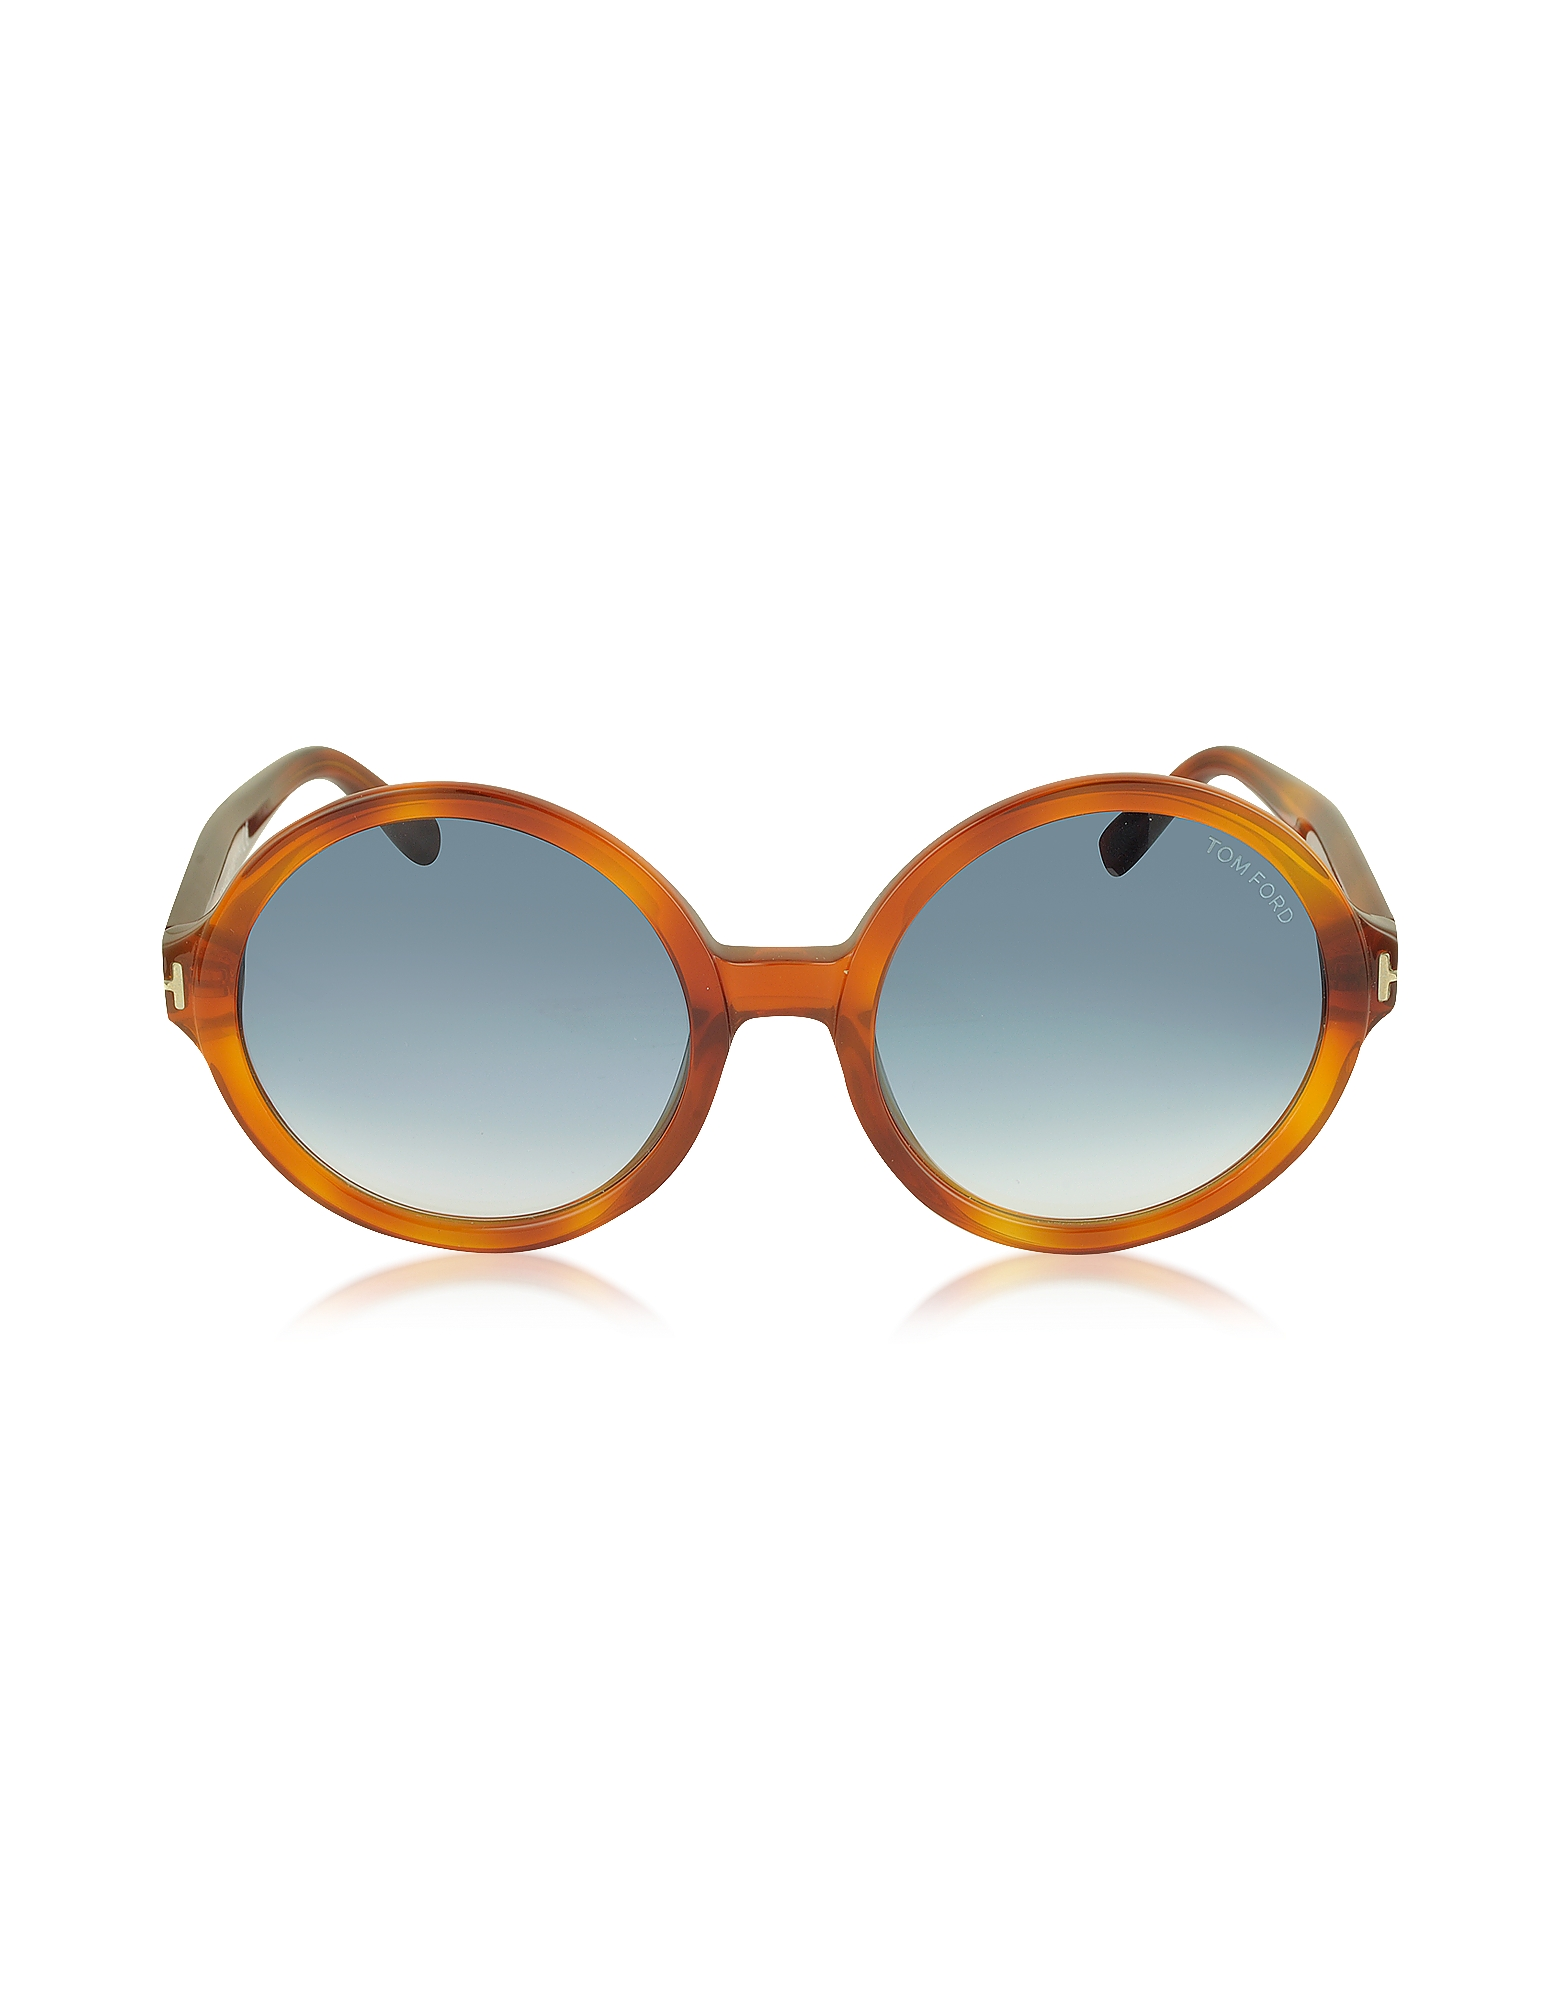 Tom Ford Sunglasses, JULIET FT0369 Acetate Round Sunglasses